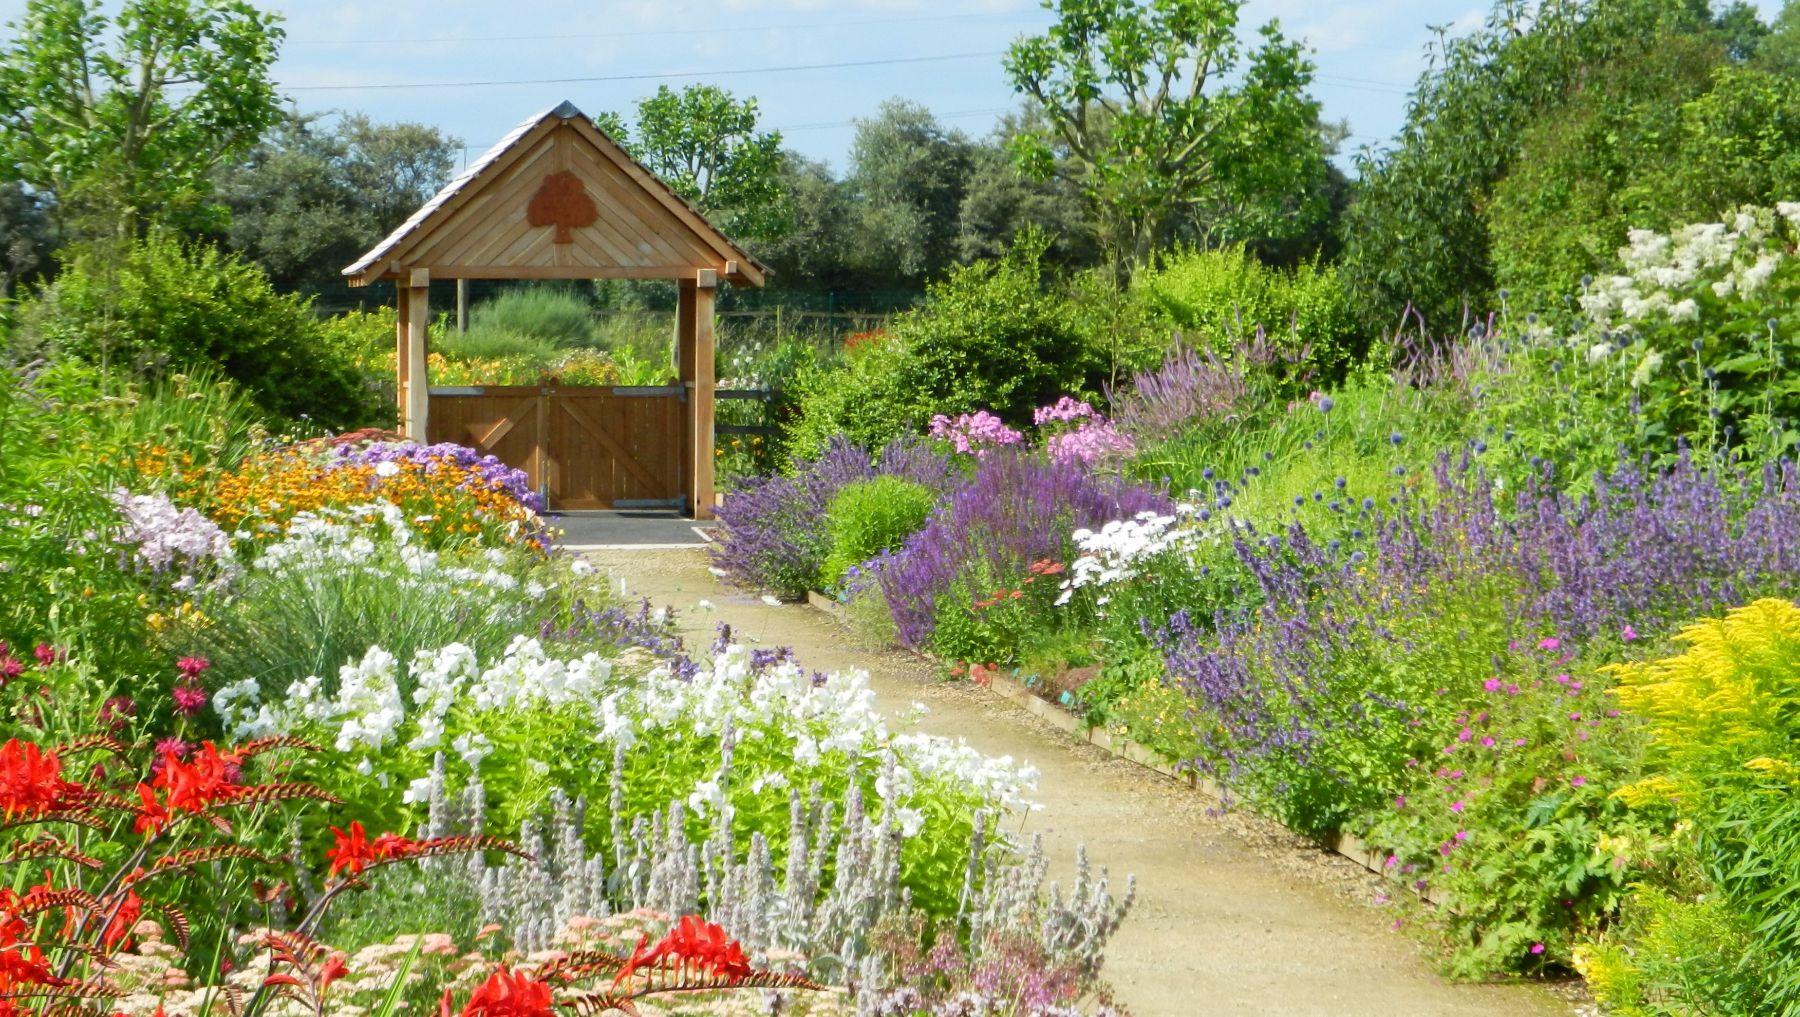 Breezy-Knees-Gardens-1.jpg